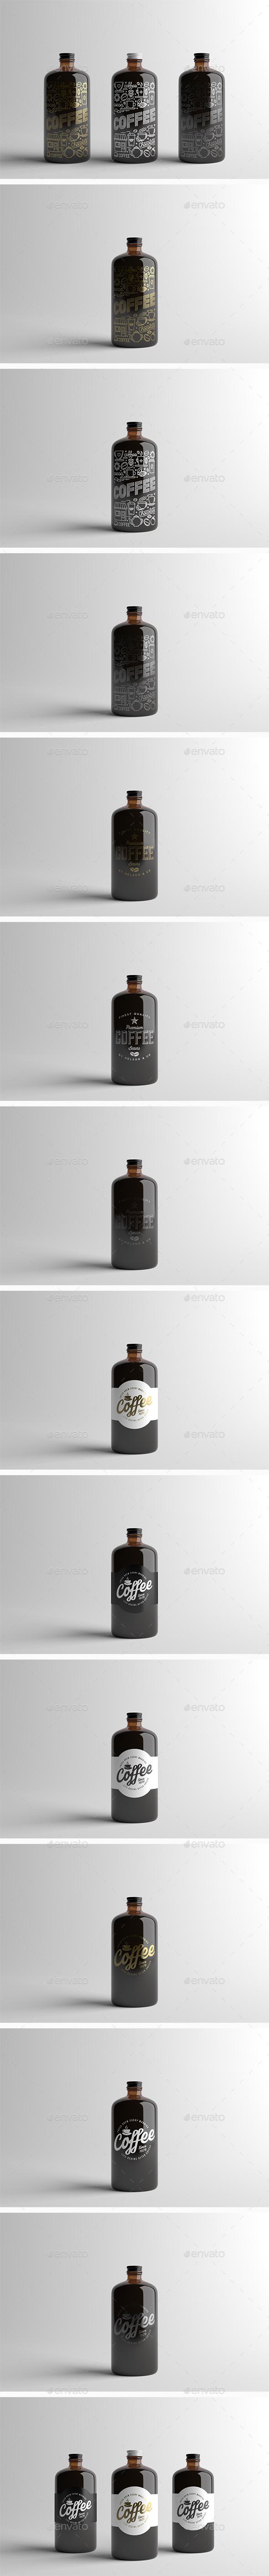 Coffee Bottle Packaging Mock-Up - Food and Drink Packaging